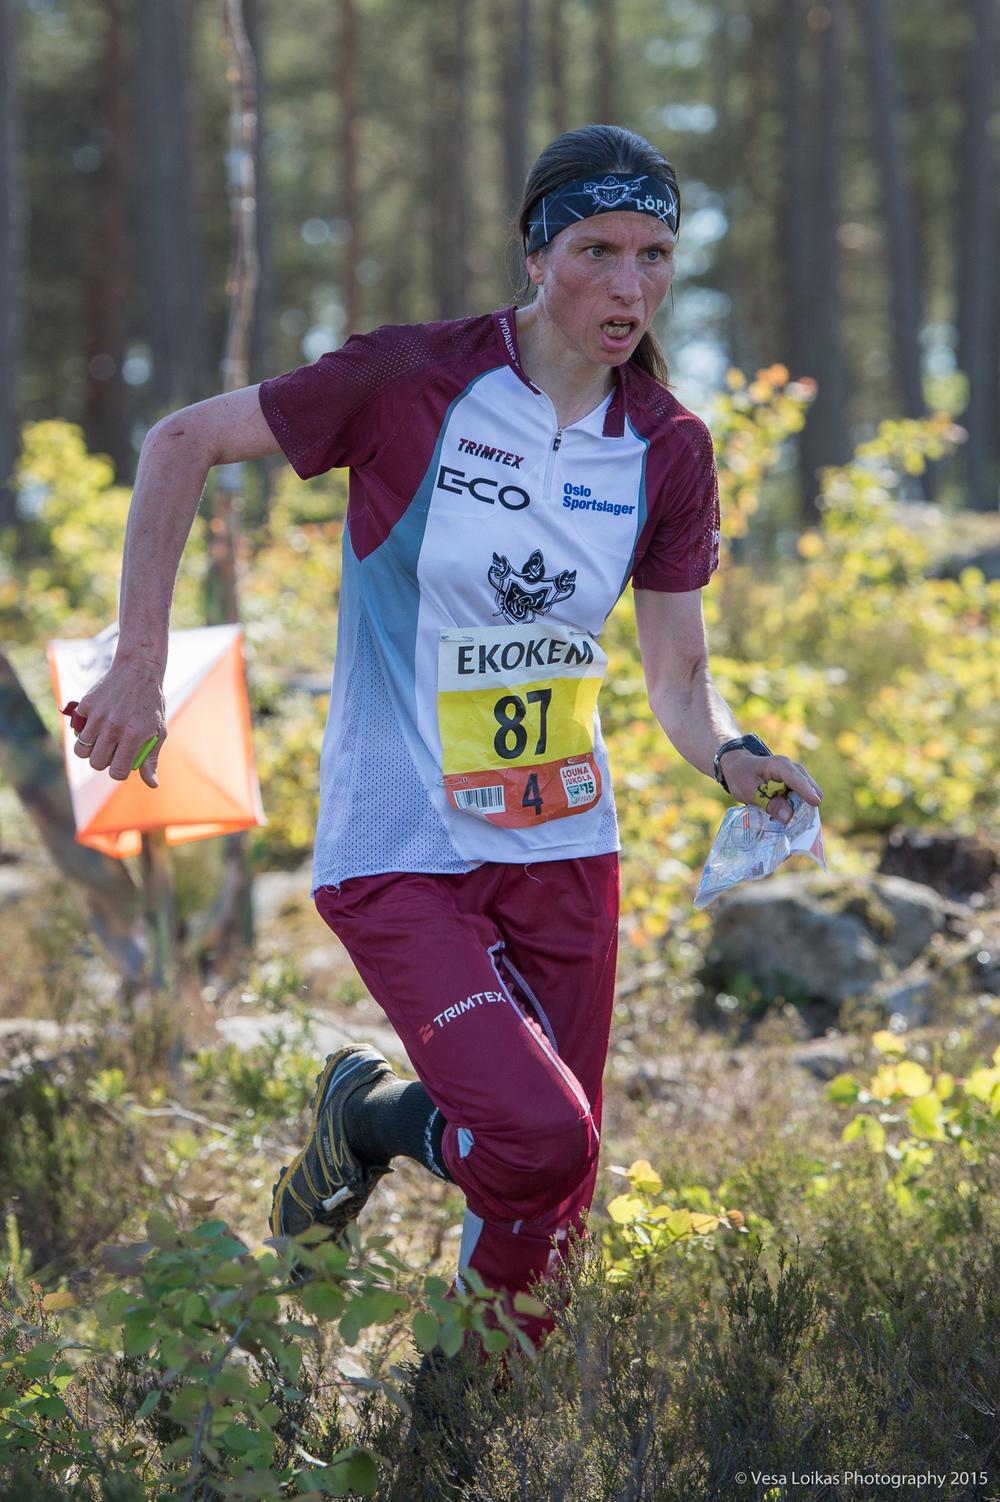 7) Nydalens SK NOR Anne M Hausken Nordberg